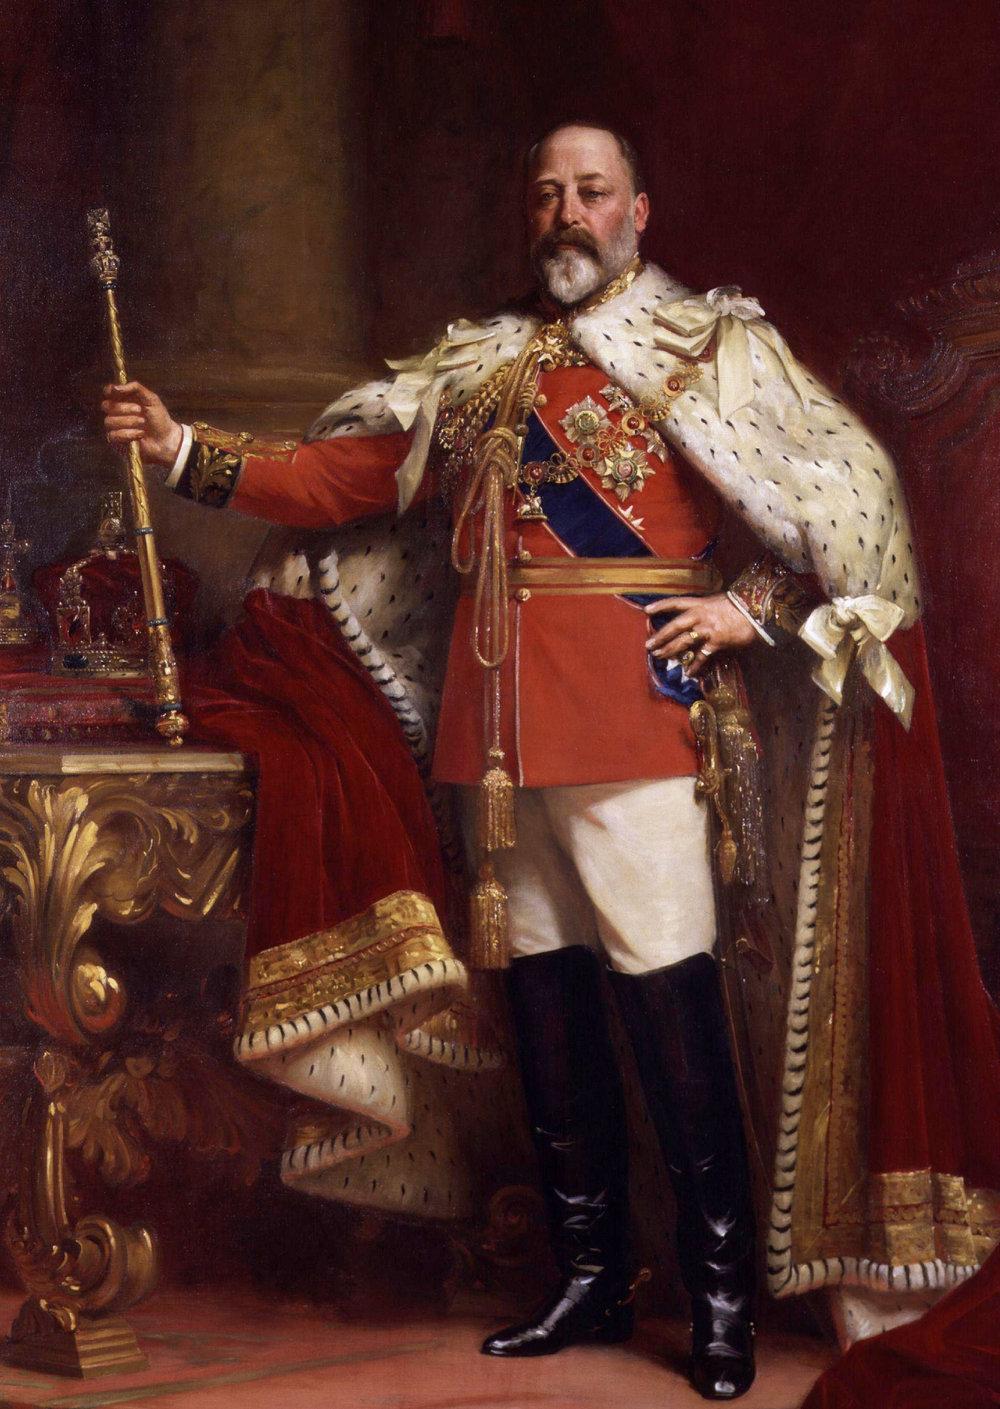 Edward_VII_in_coronation_robes.jpg